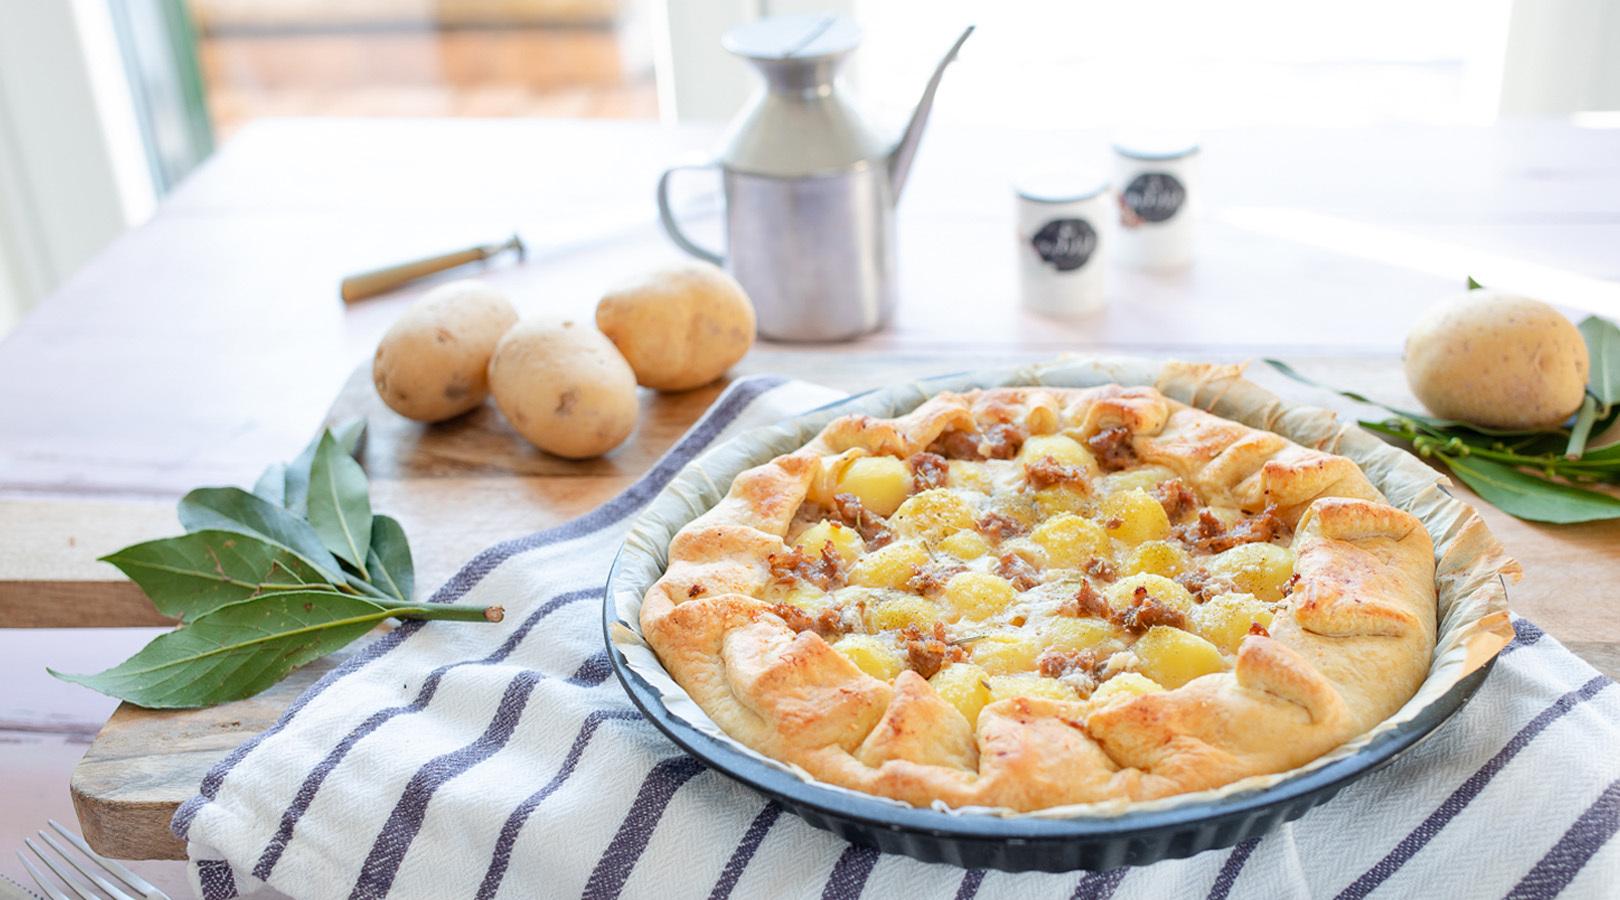 Torta salata con patate novelle e salsiccia